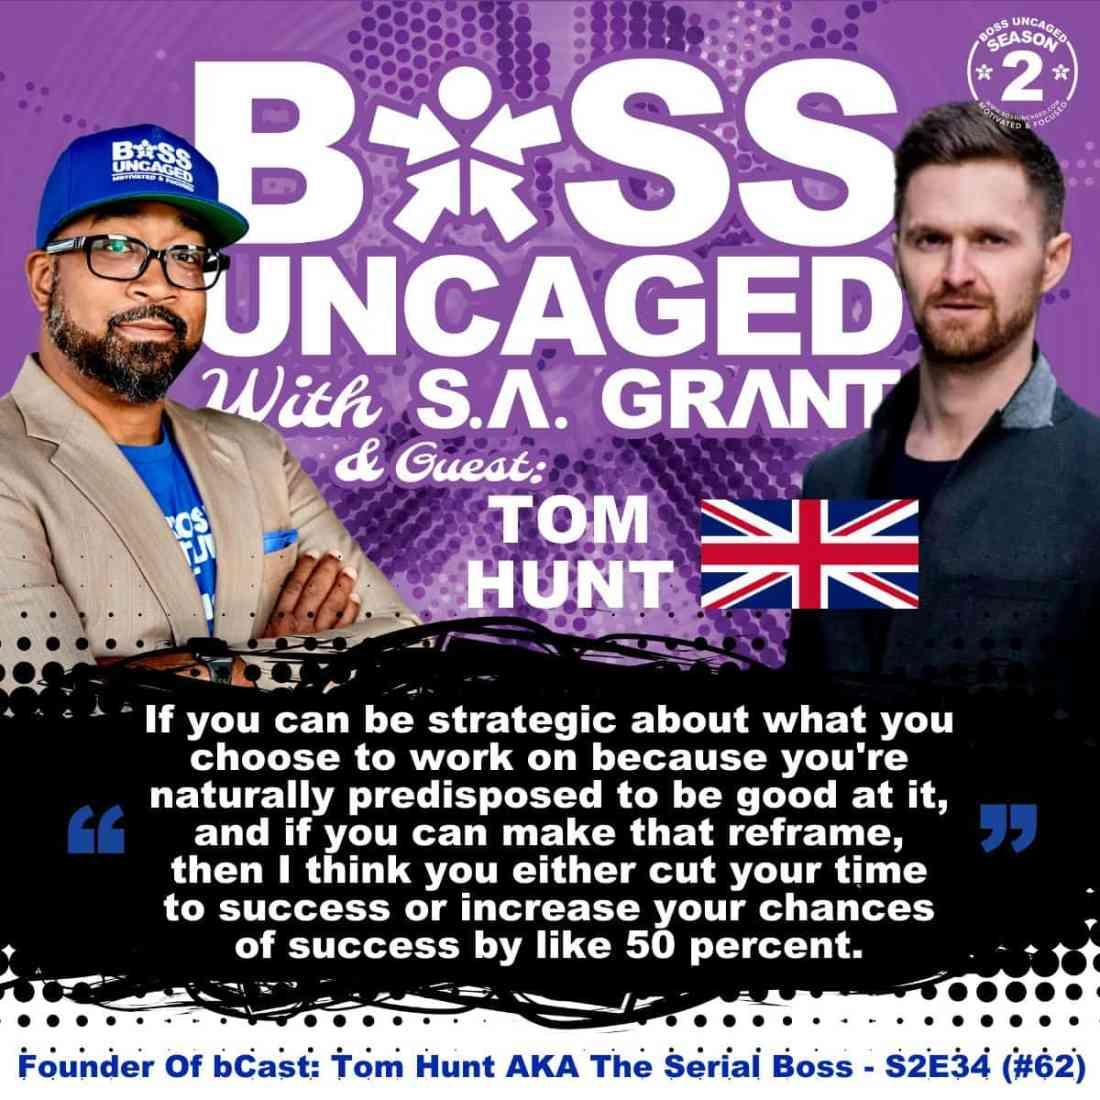 Founder Of bCast: Tom Hunt AKA The Serial Boss - S2E34 (#62)